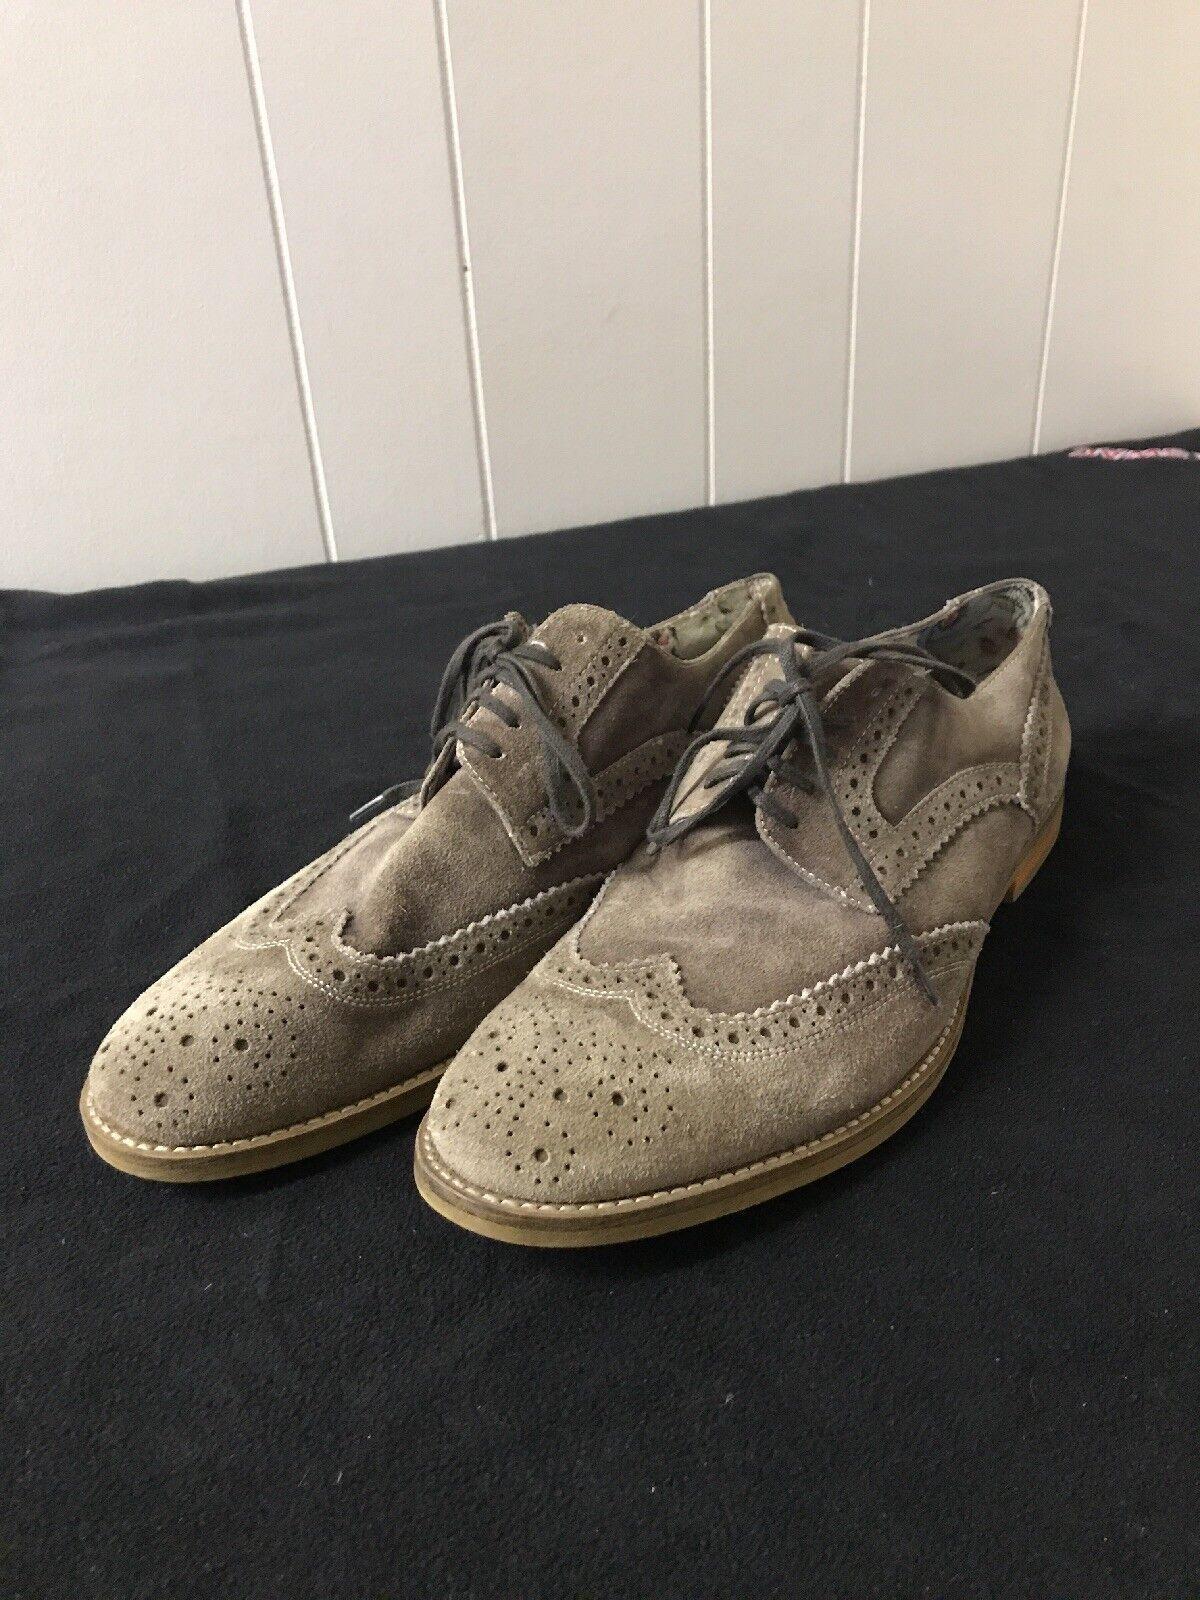 Vince Camuto Venety Brown / Tan Wingtip Suede Oxford Dress shoes uomo's Size 11.5 Scarpe classiche da uomo